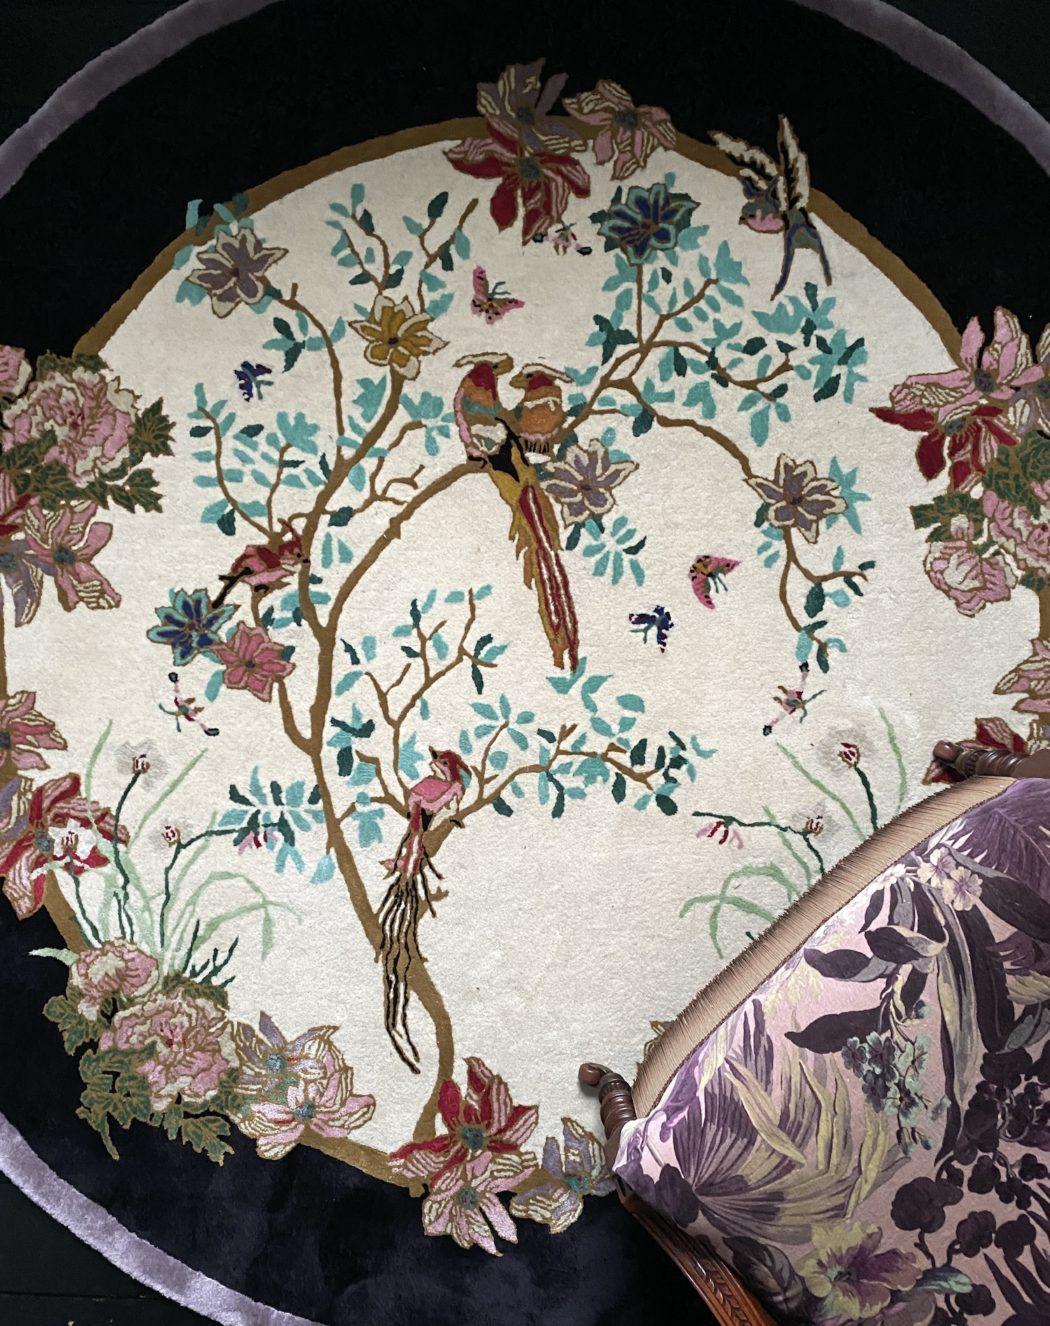 Circular, round rug